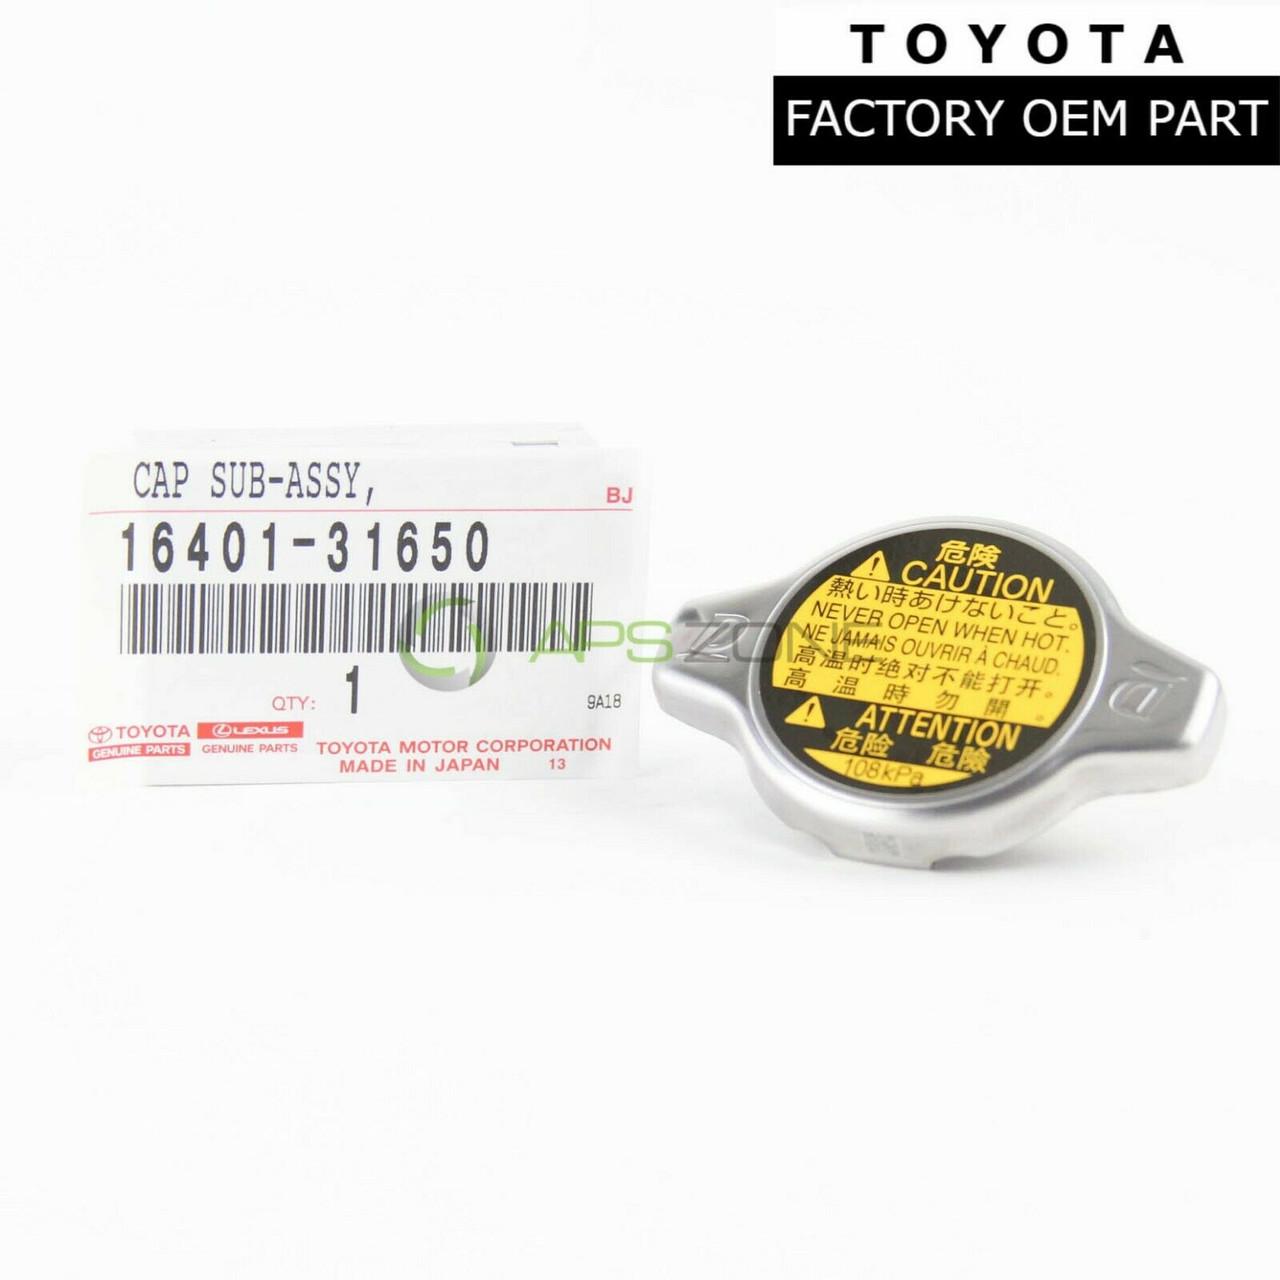 Genuine Radiator Cap For Toyota Lexus 4Runner Tacoma 16401-31650